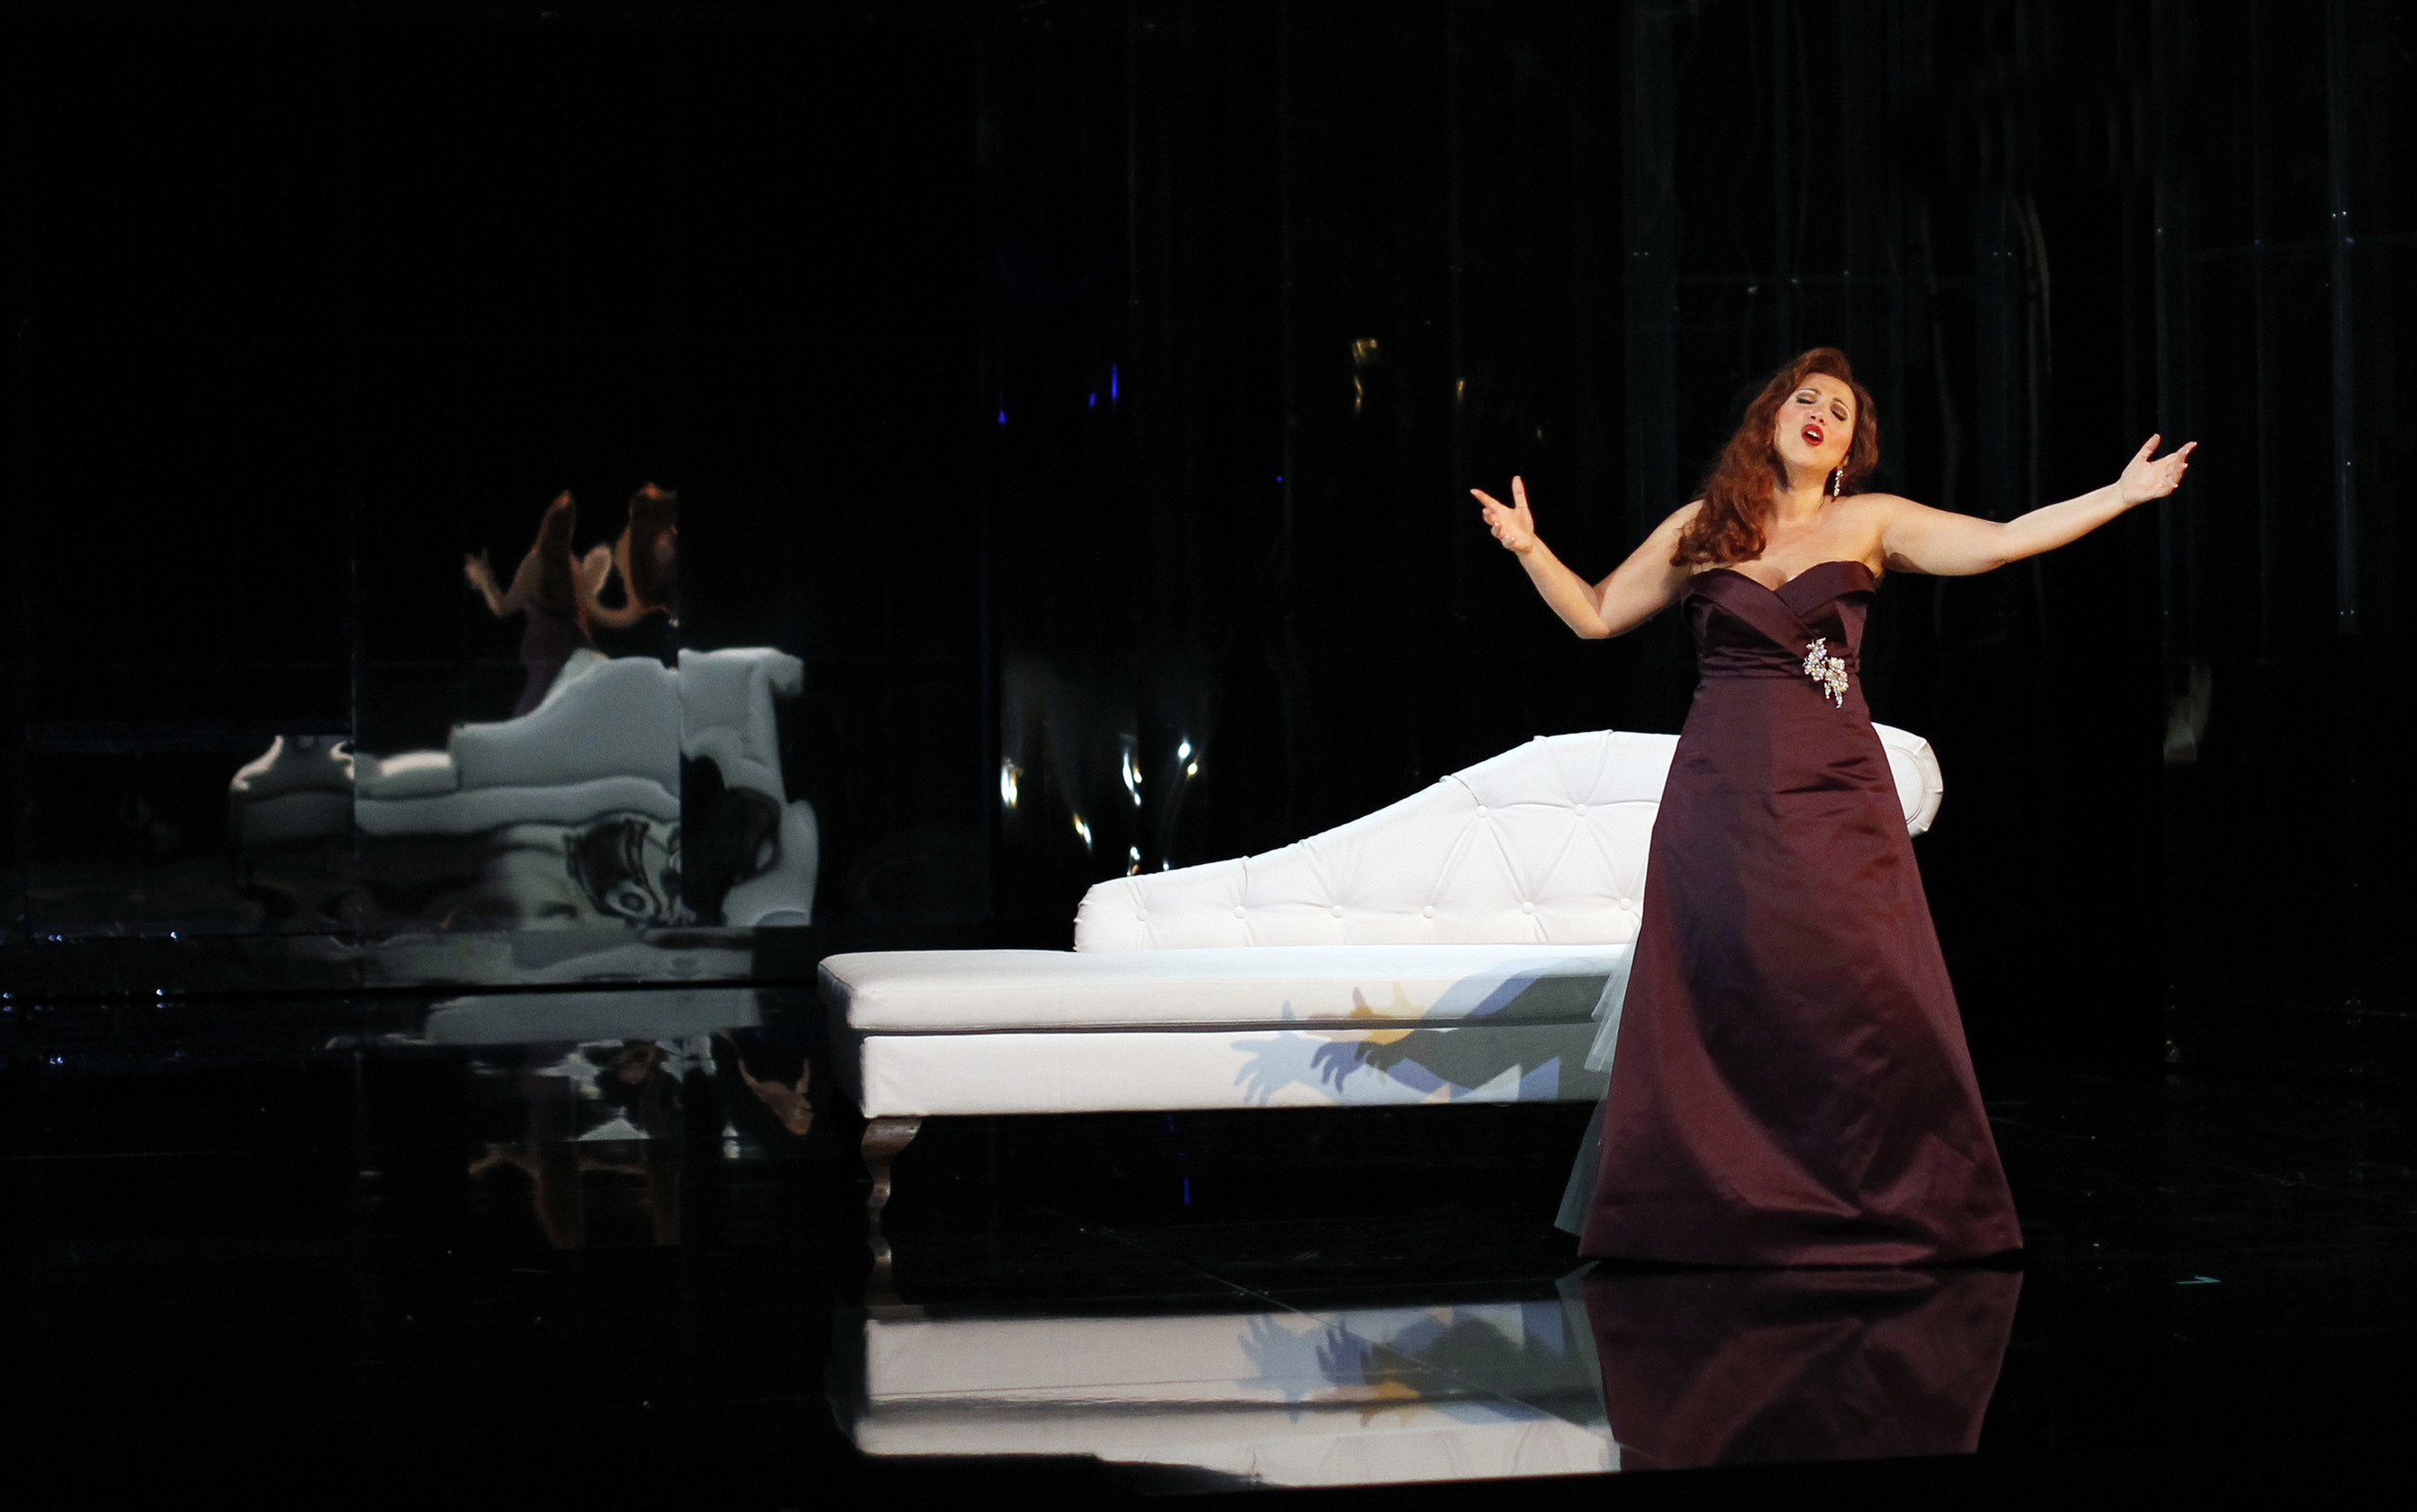 La Traviata-Madrid (Escorial)-2013 (11).jpg